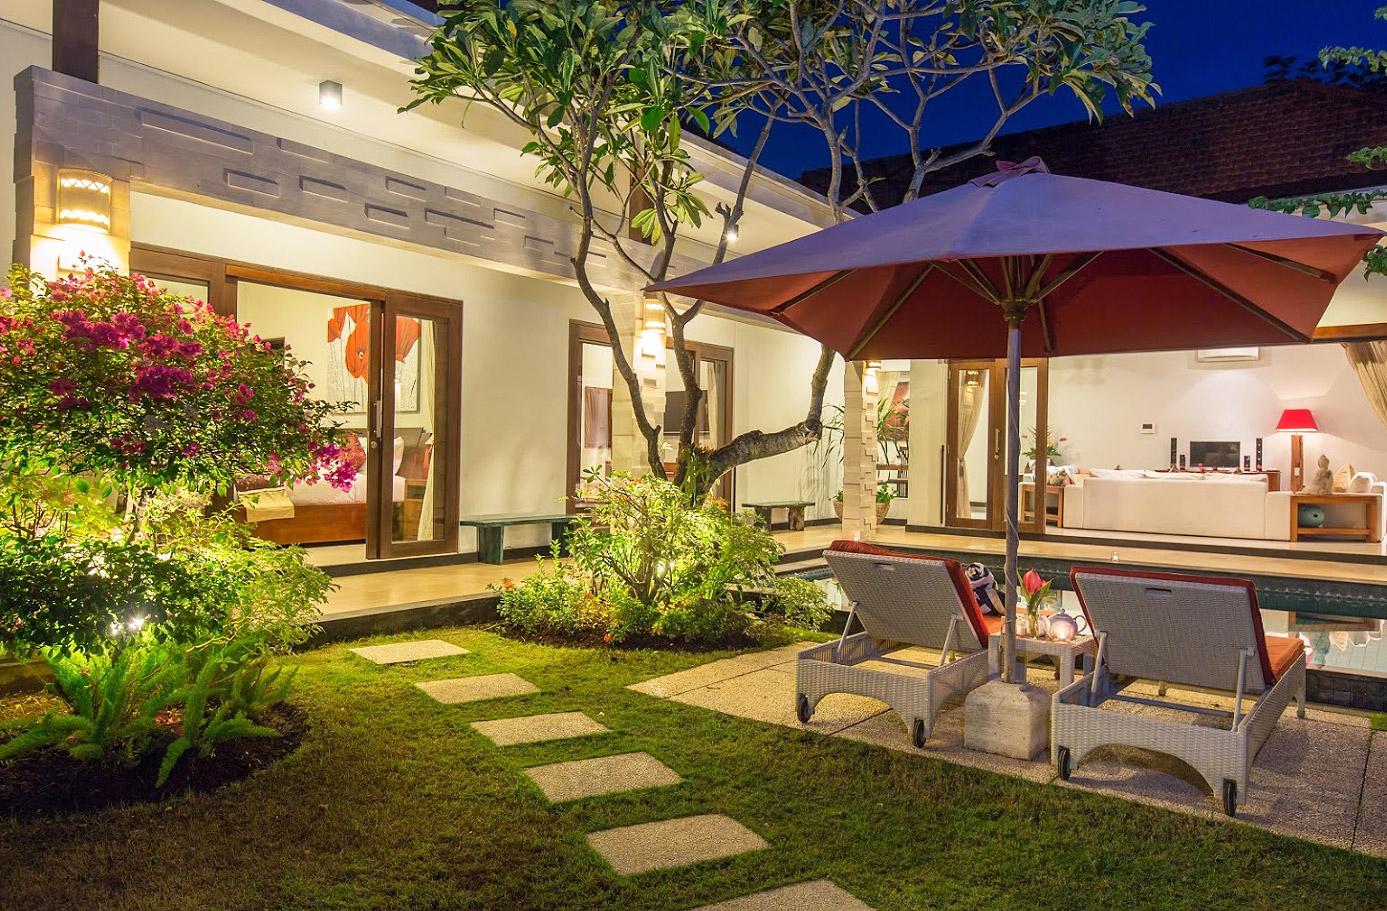 Bali villa amabel 3 bedrooms seminyak 4 bali villas for 6 bedroom villa bali